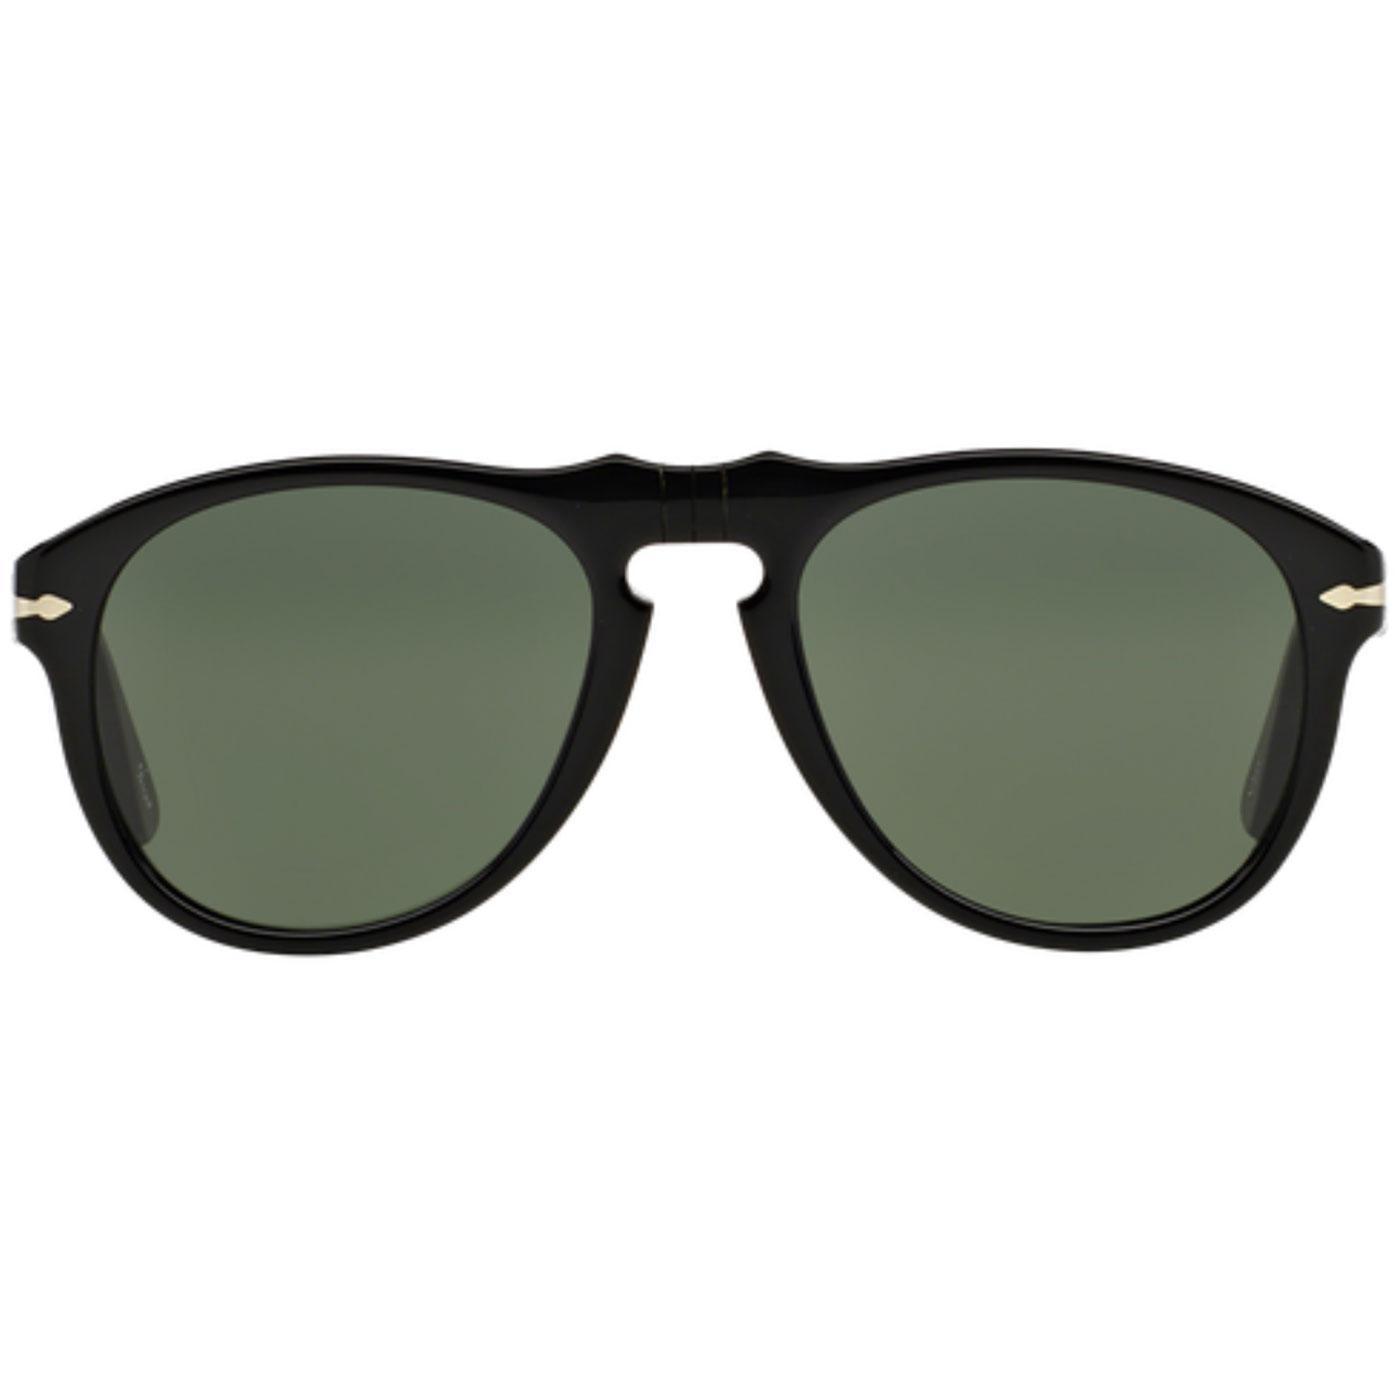 649 Series PERSOL Original Mod Sunglasses Black